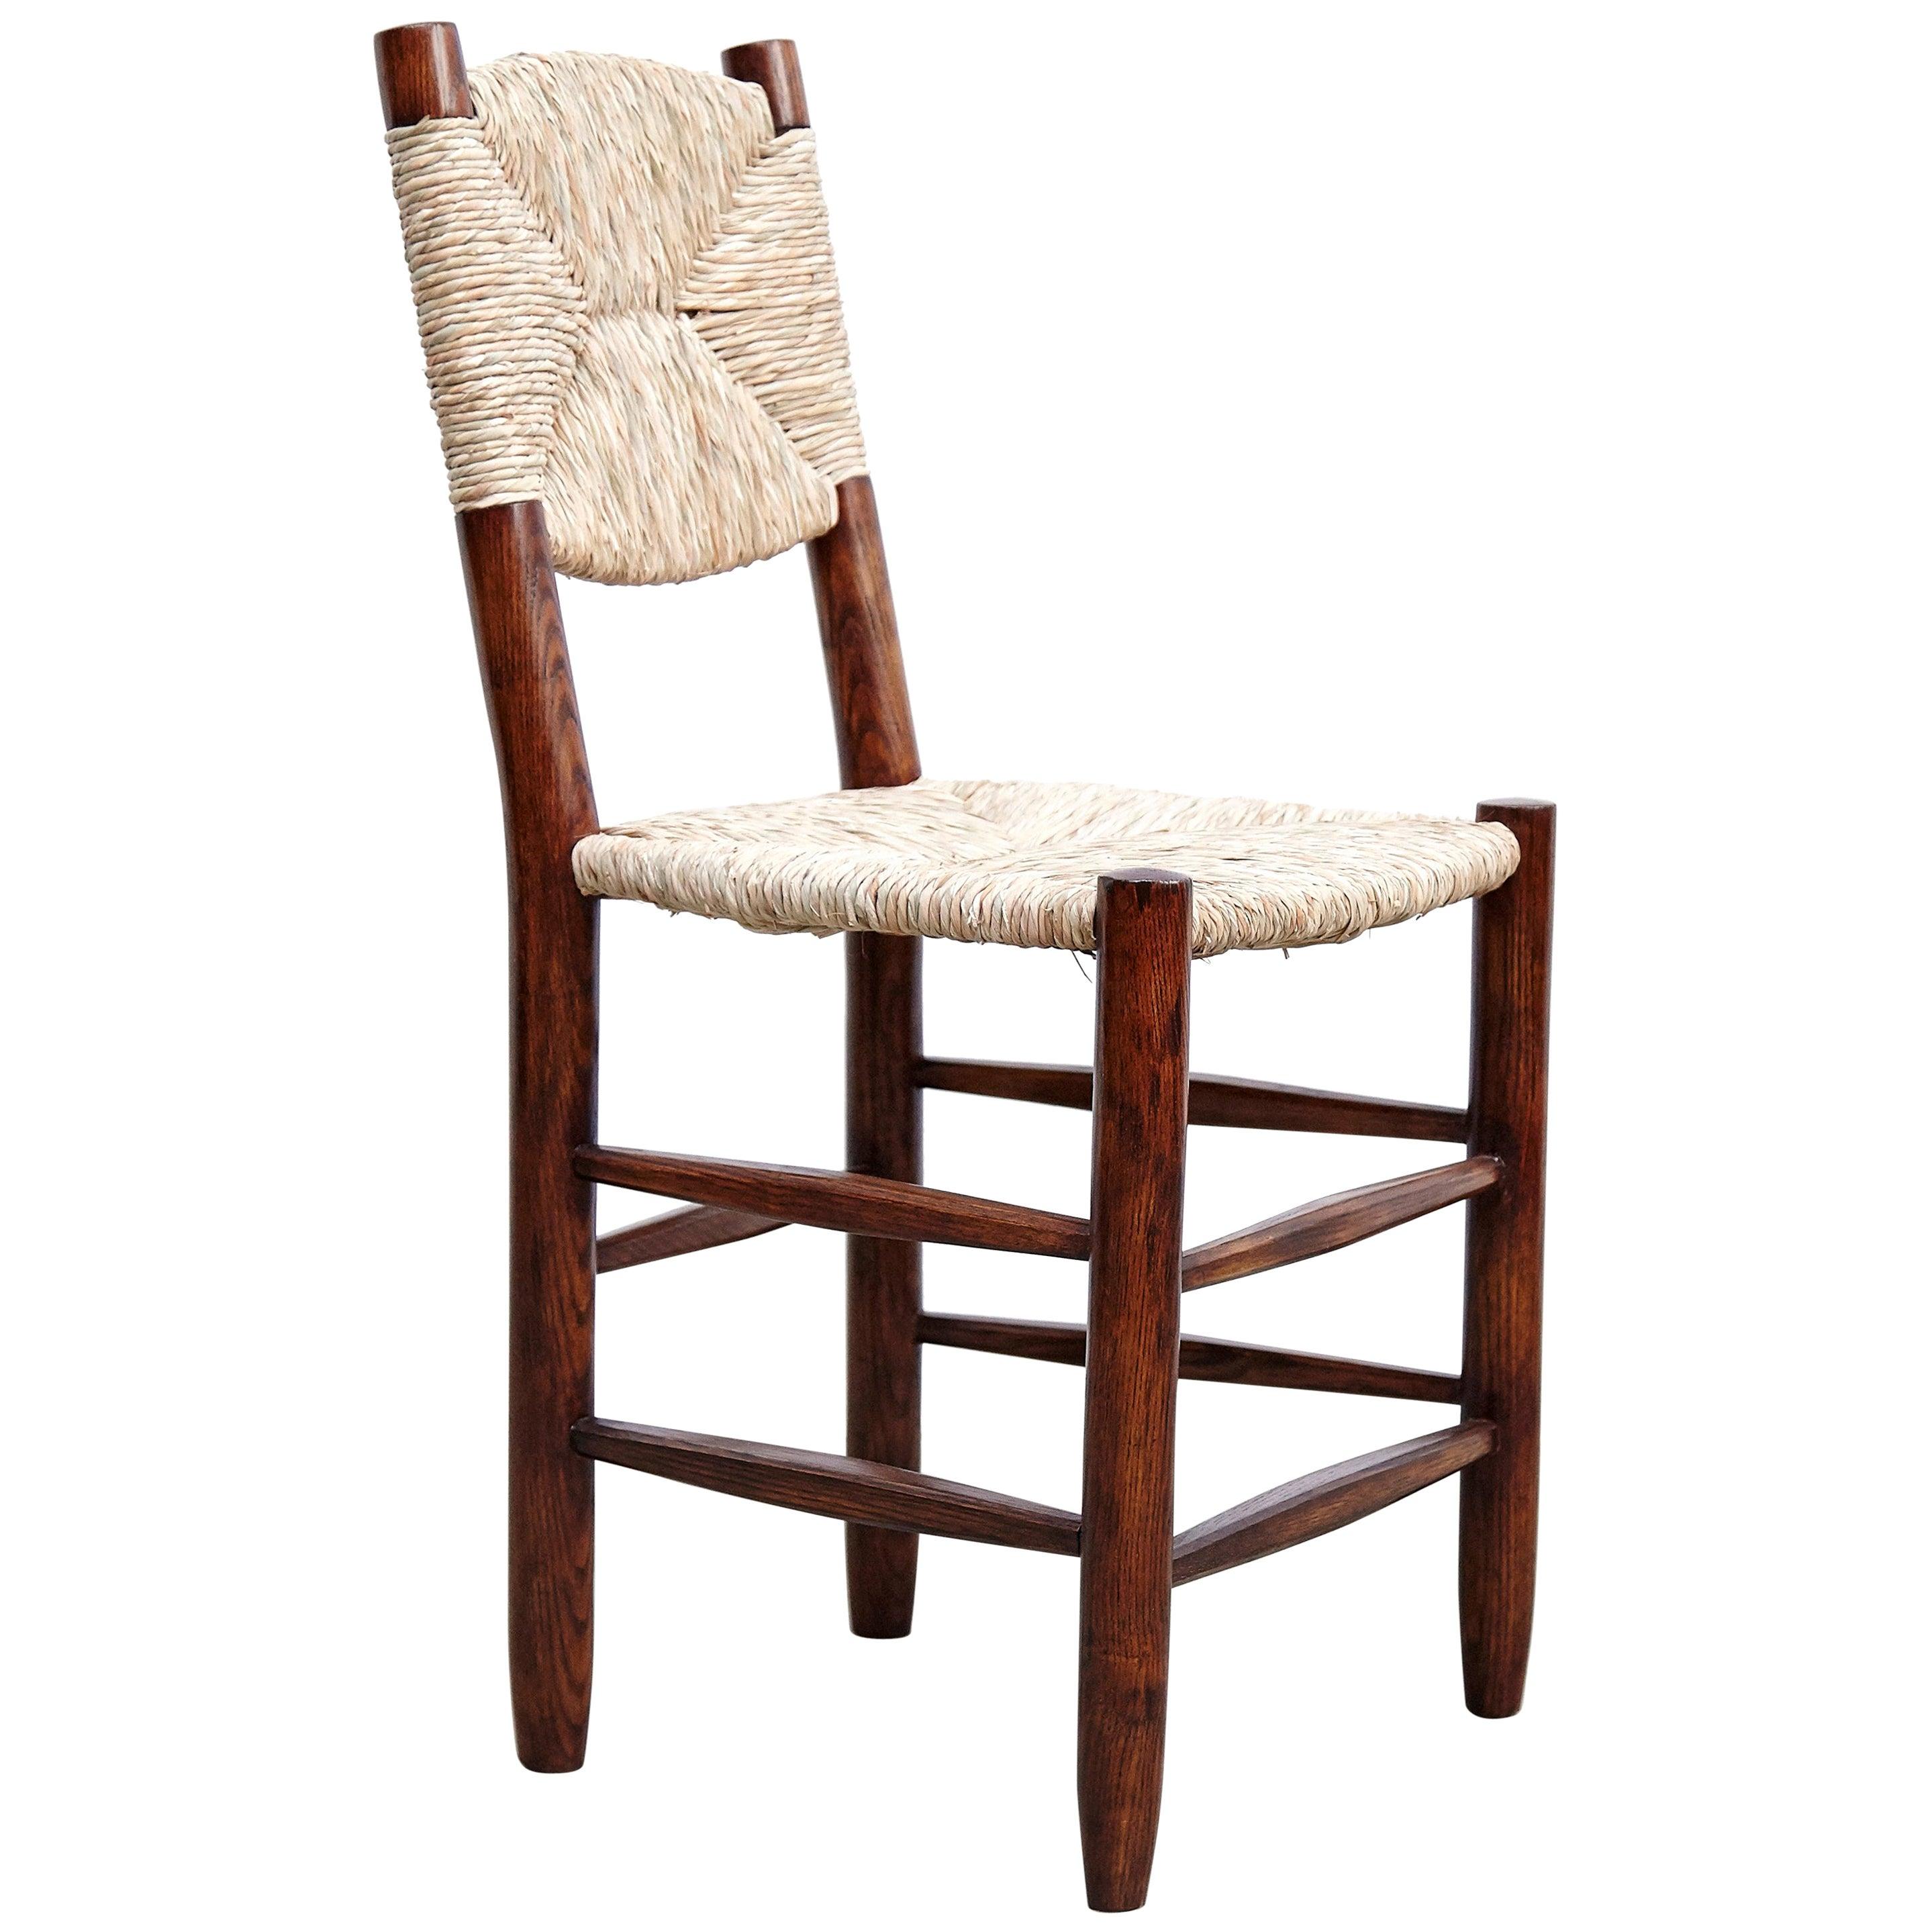 Charlotte Perriand Mid-Century Modern, Oak Rattan, Model 19 Bauche Chair, 1950